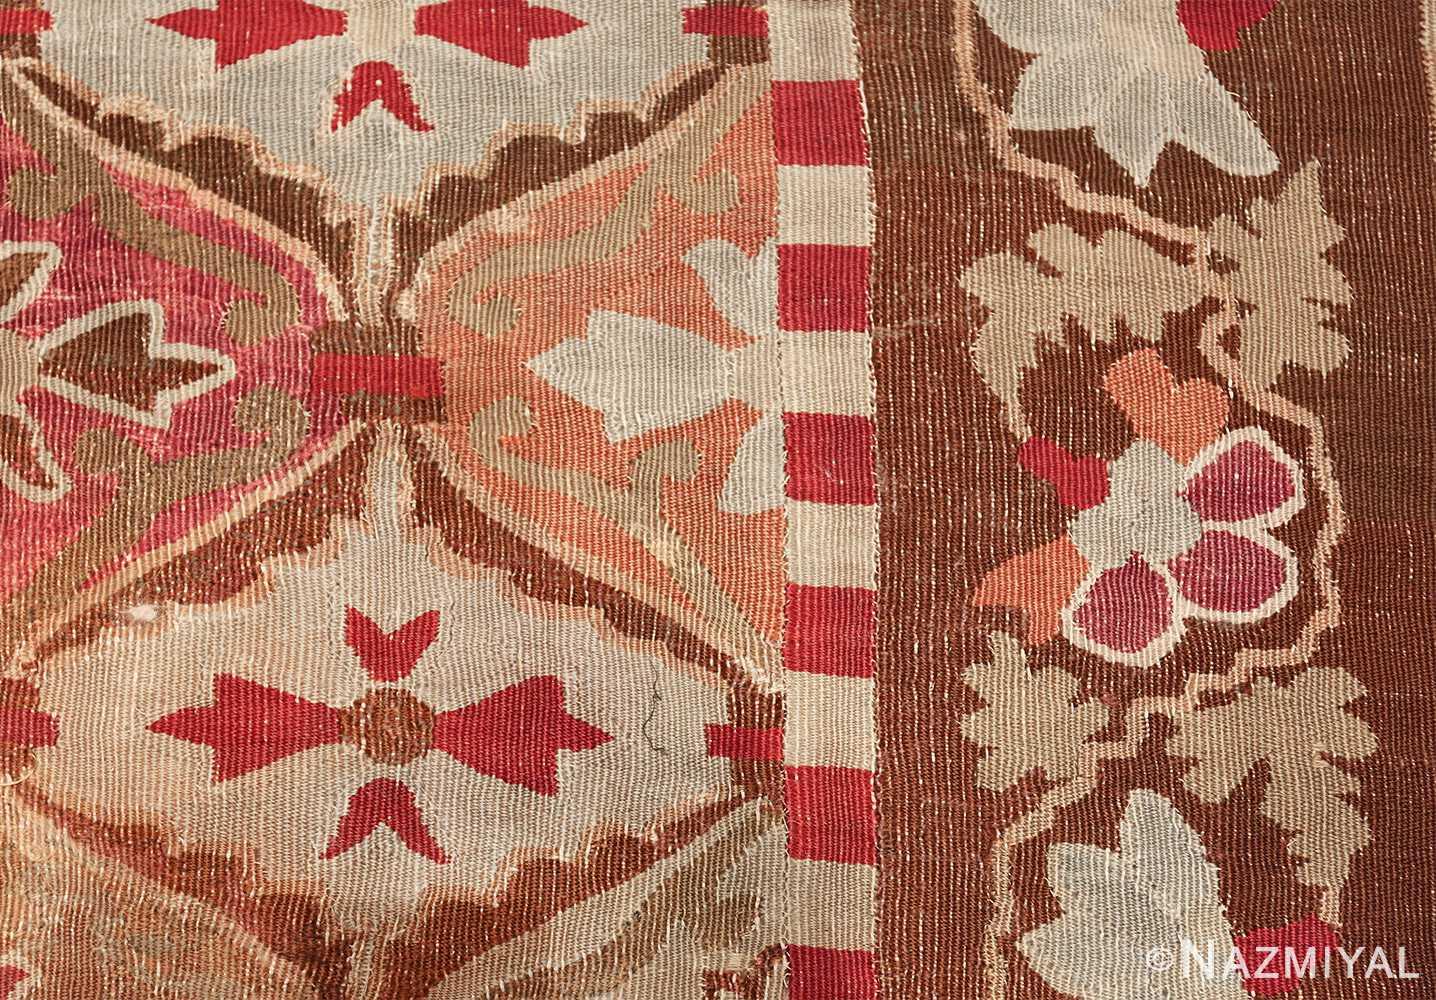 antique square french aubusson rug 47138 border Nazmiyal